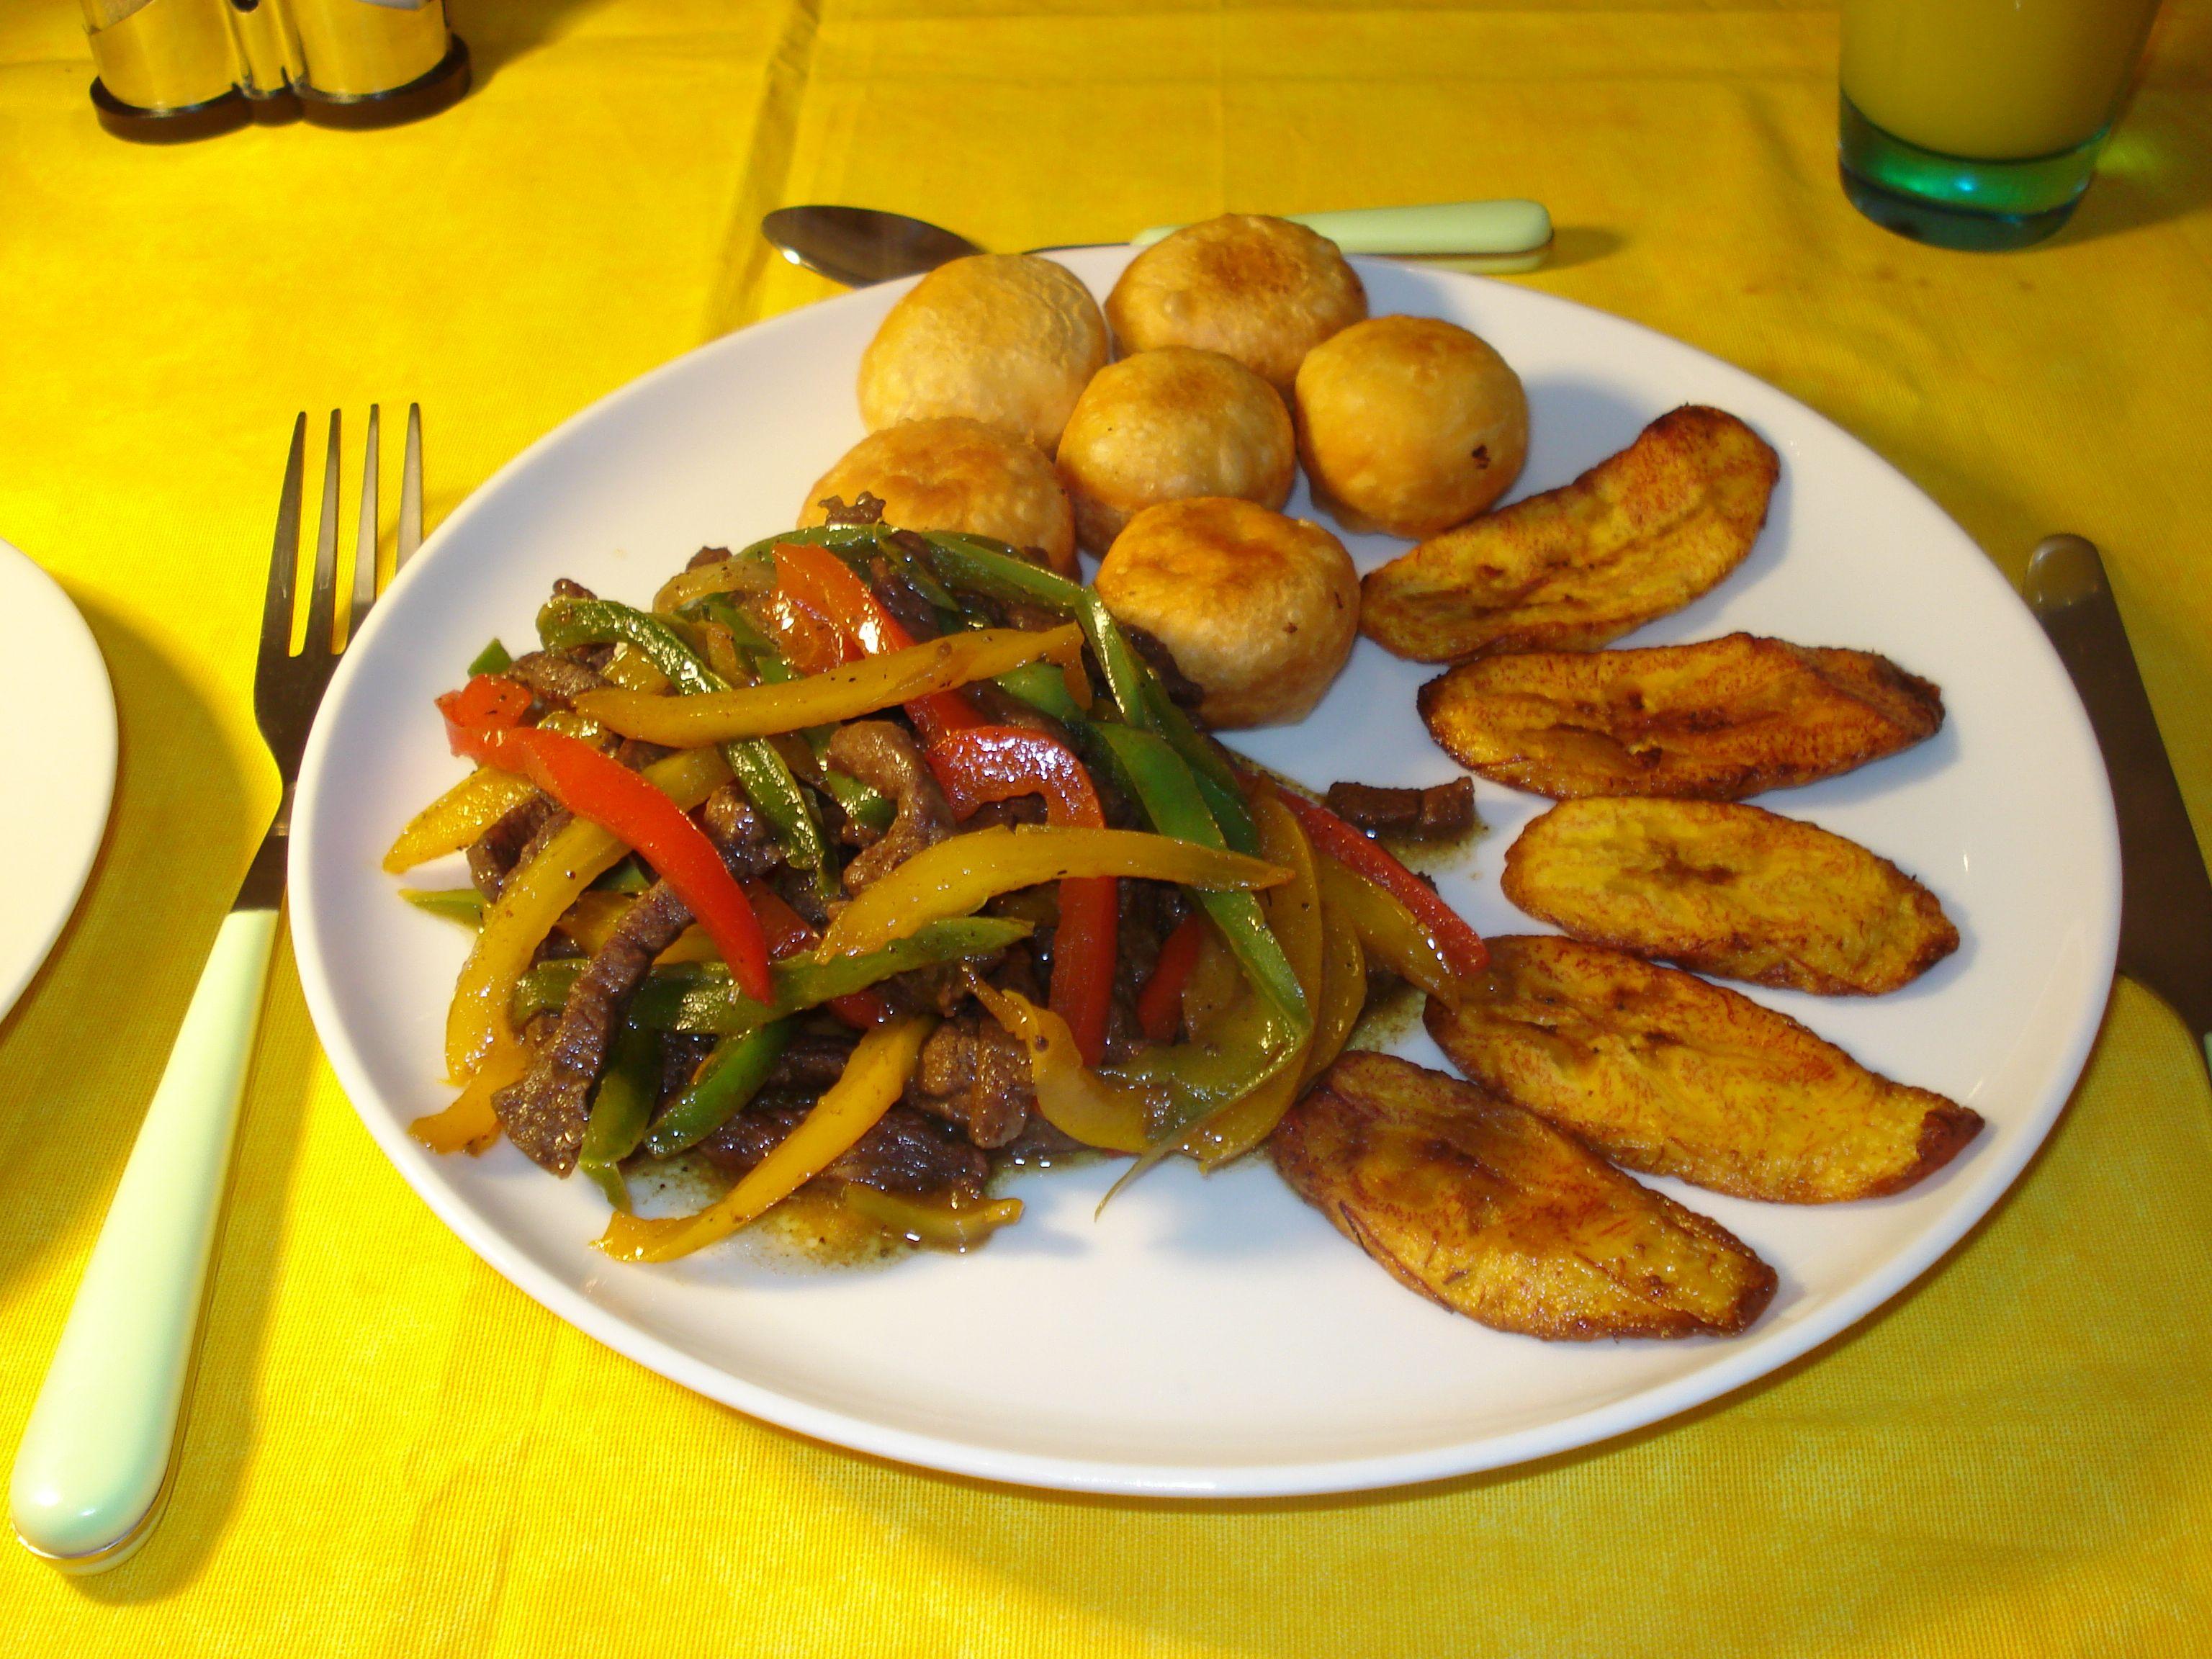 Jamaican pepper steak recipe will pepper vegan style substituting jamaican pepper steak recipe simple easy and tasty forumfinder Images